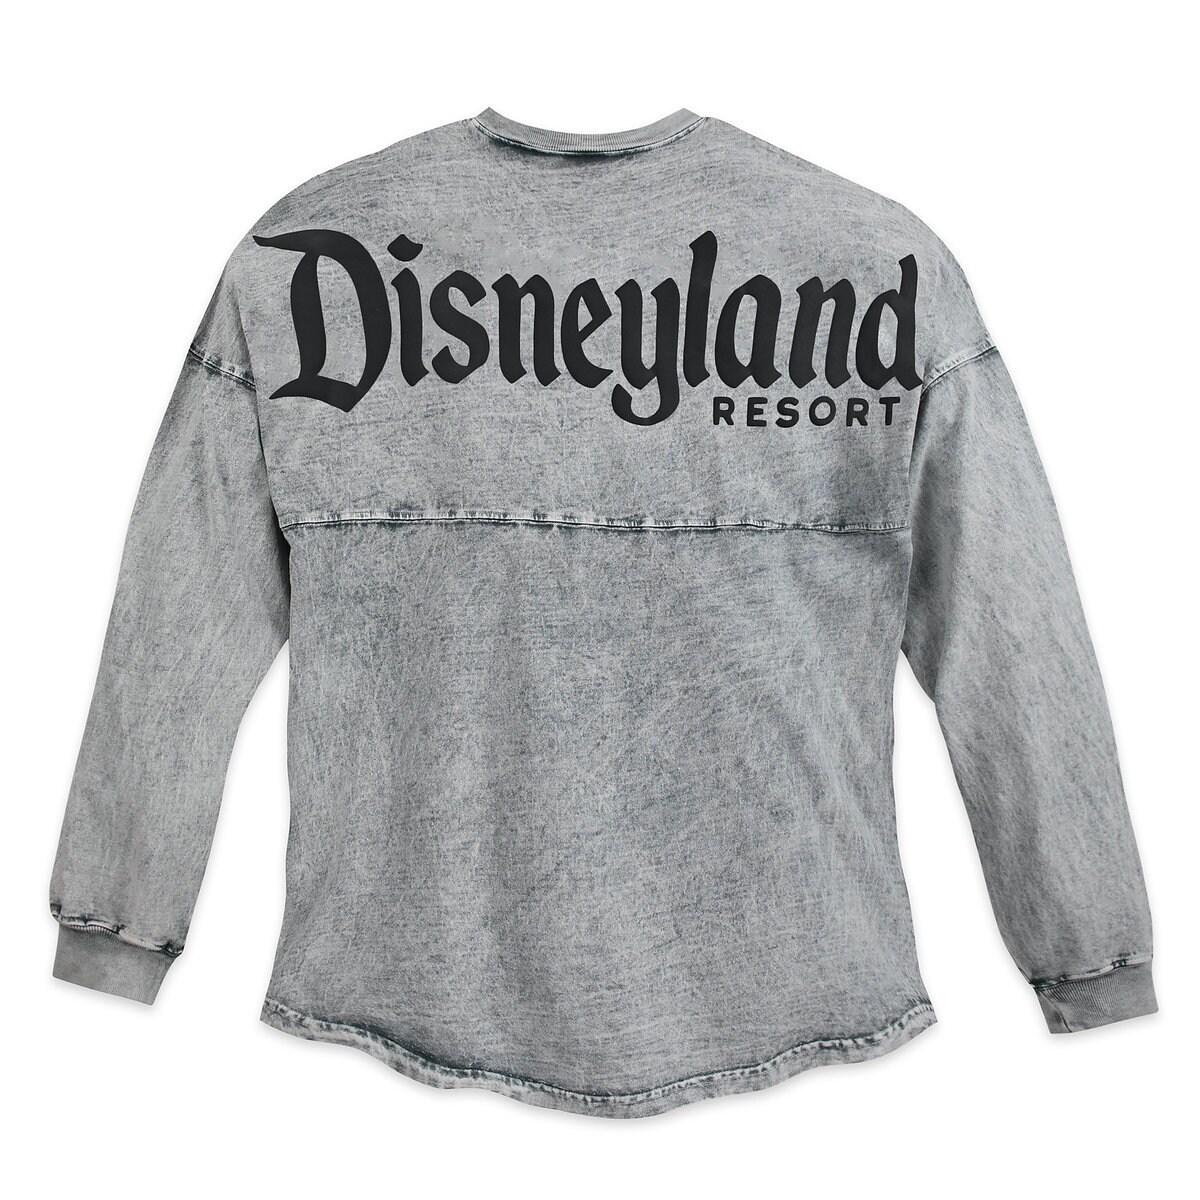 b65e9020b11 Disneyland Mineral Wash Spirit Jersey for Adults - Gray   shopDisney